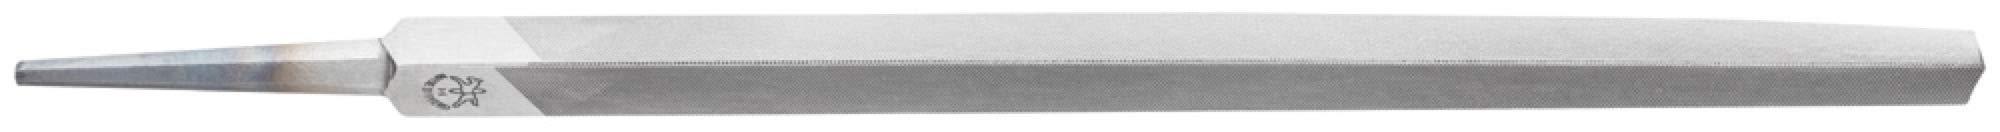 PFERD 11102 8'' Three Square File Smooth Cut (10pk)